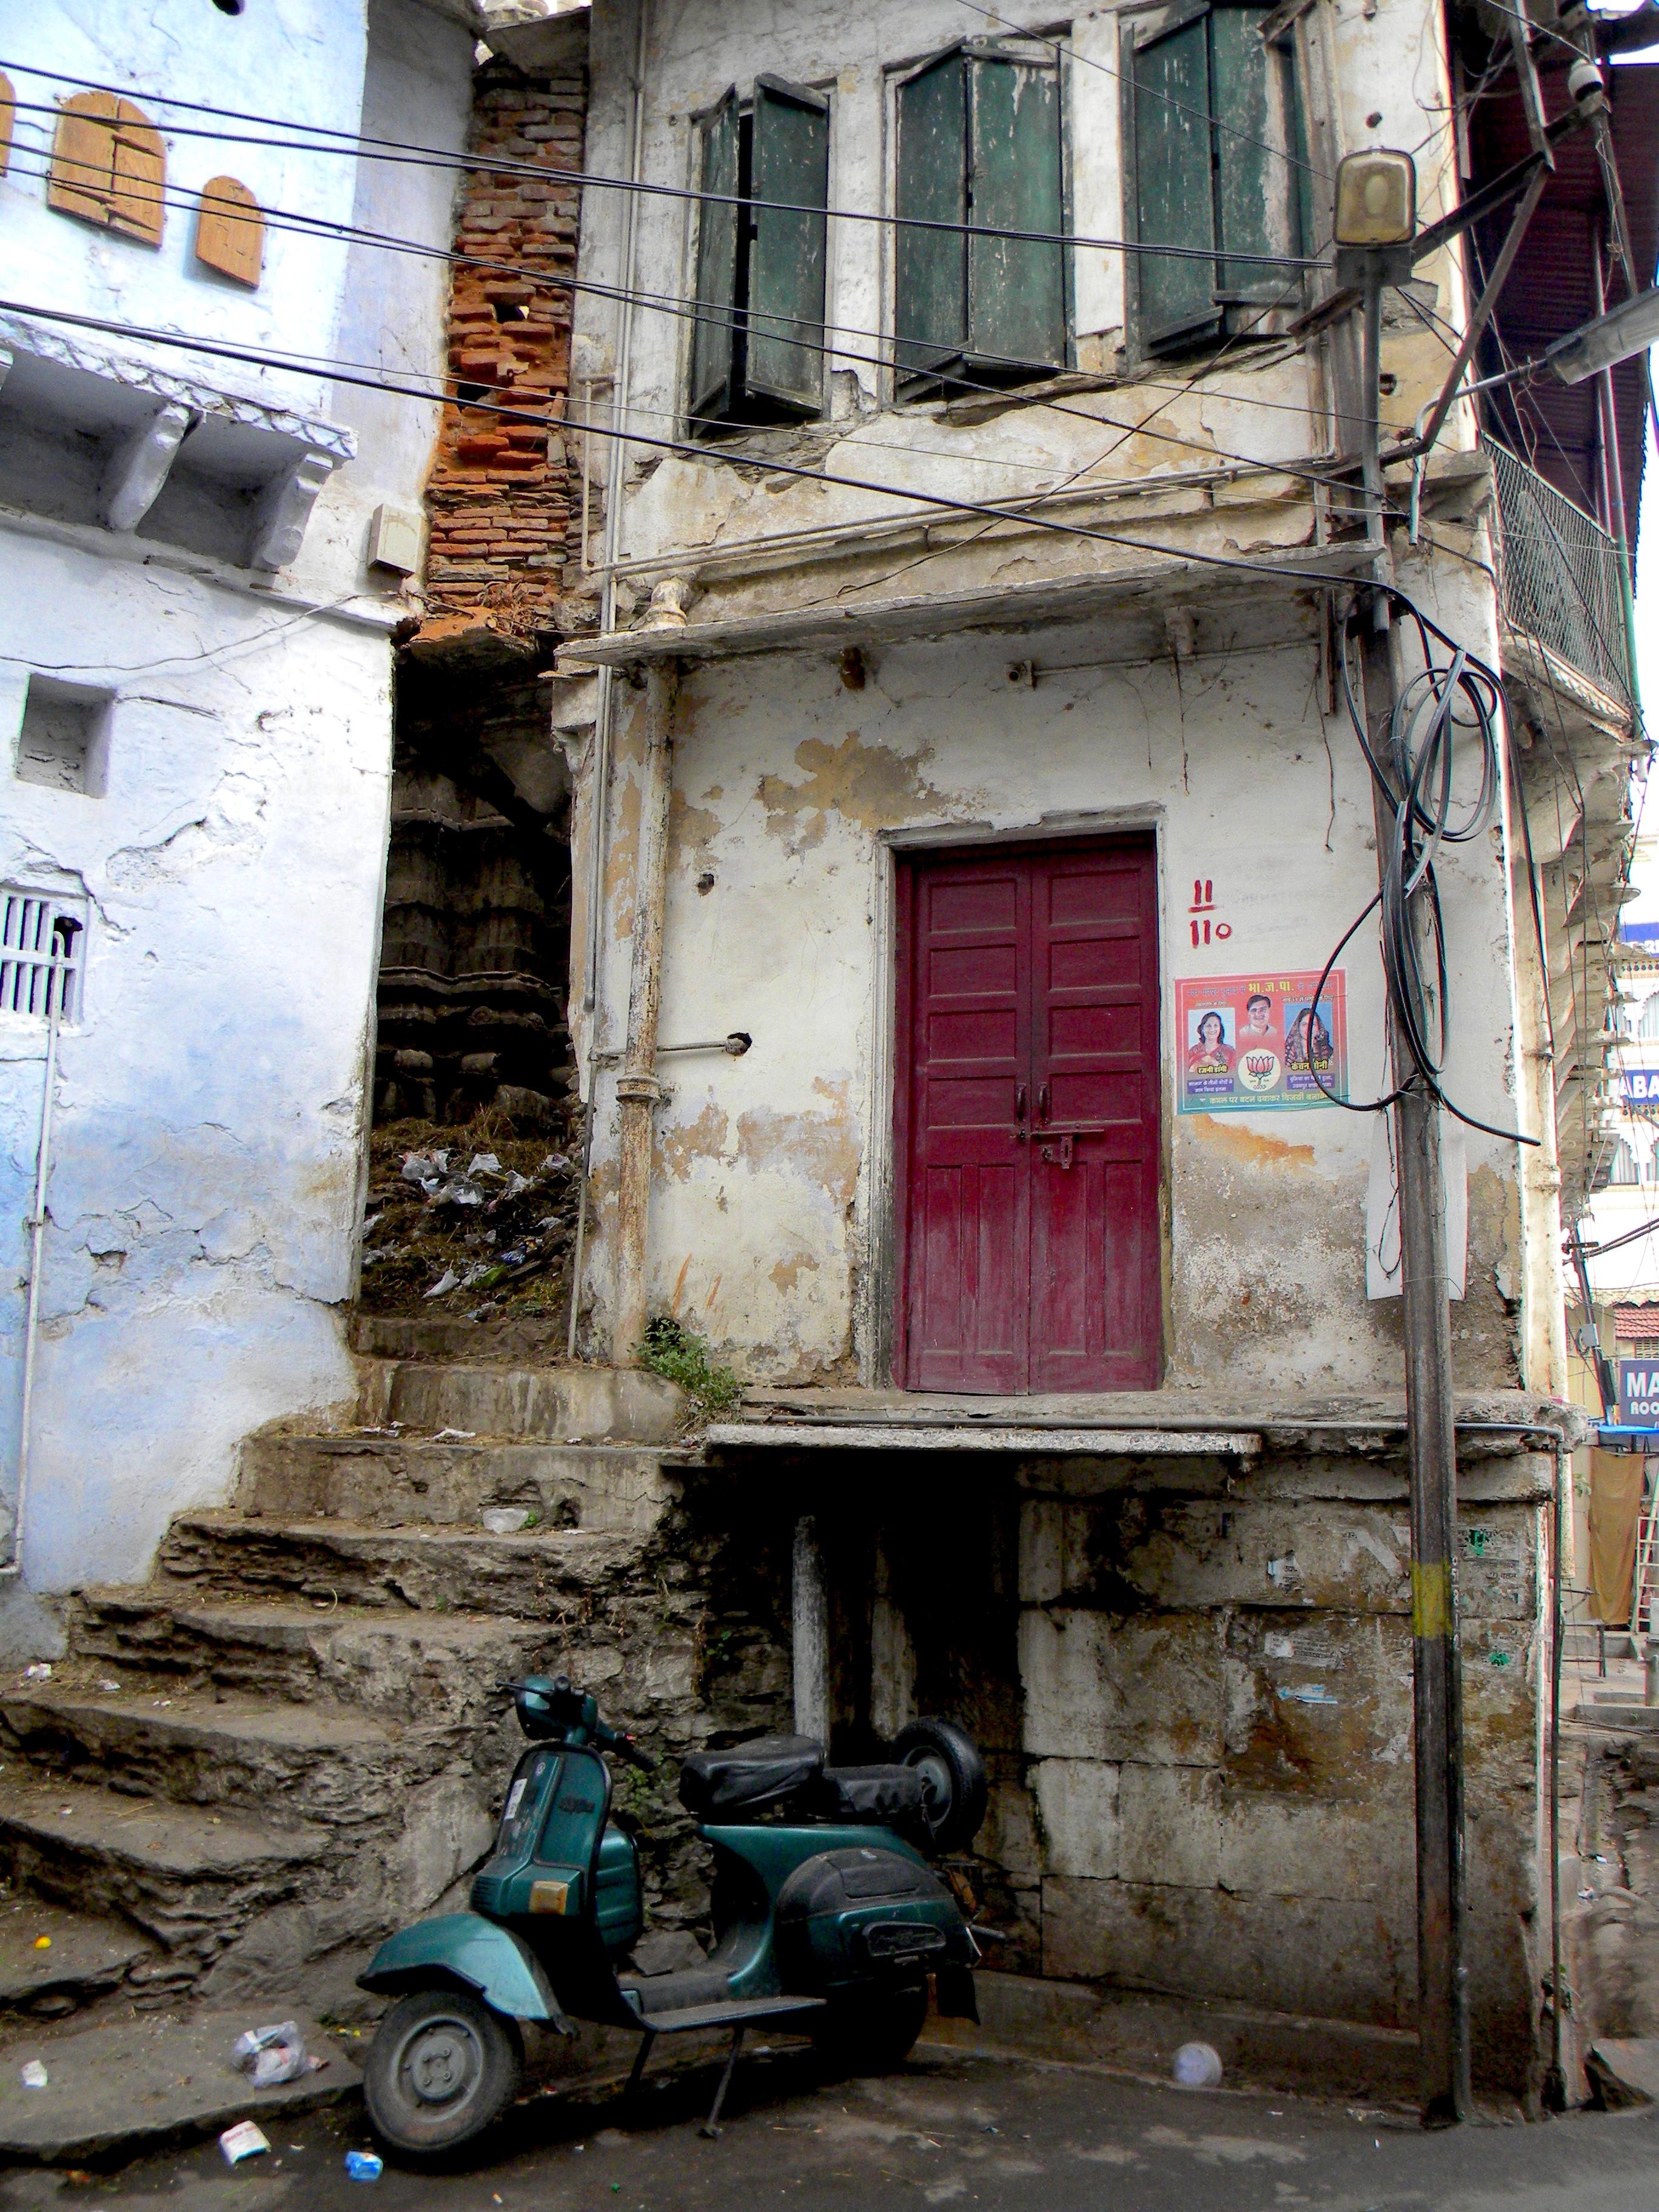 House, India 2010